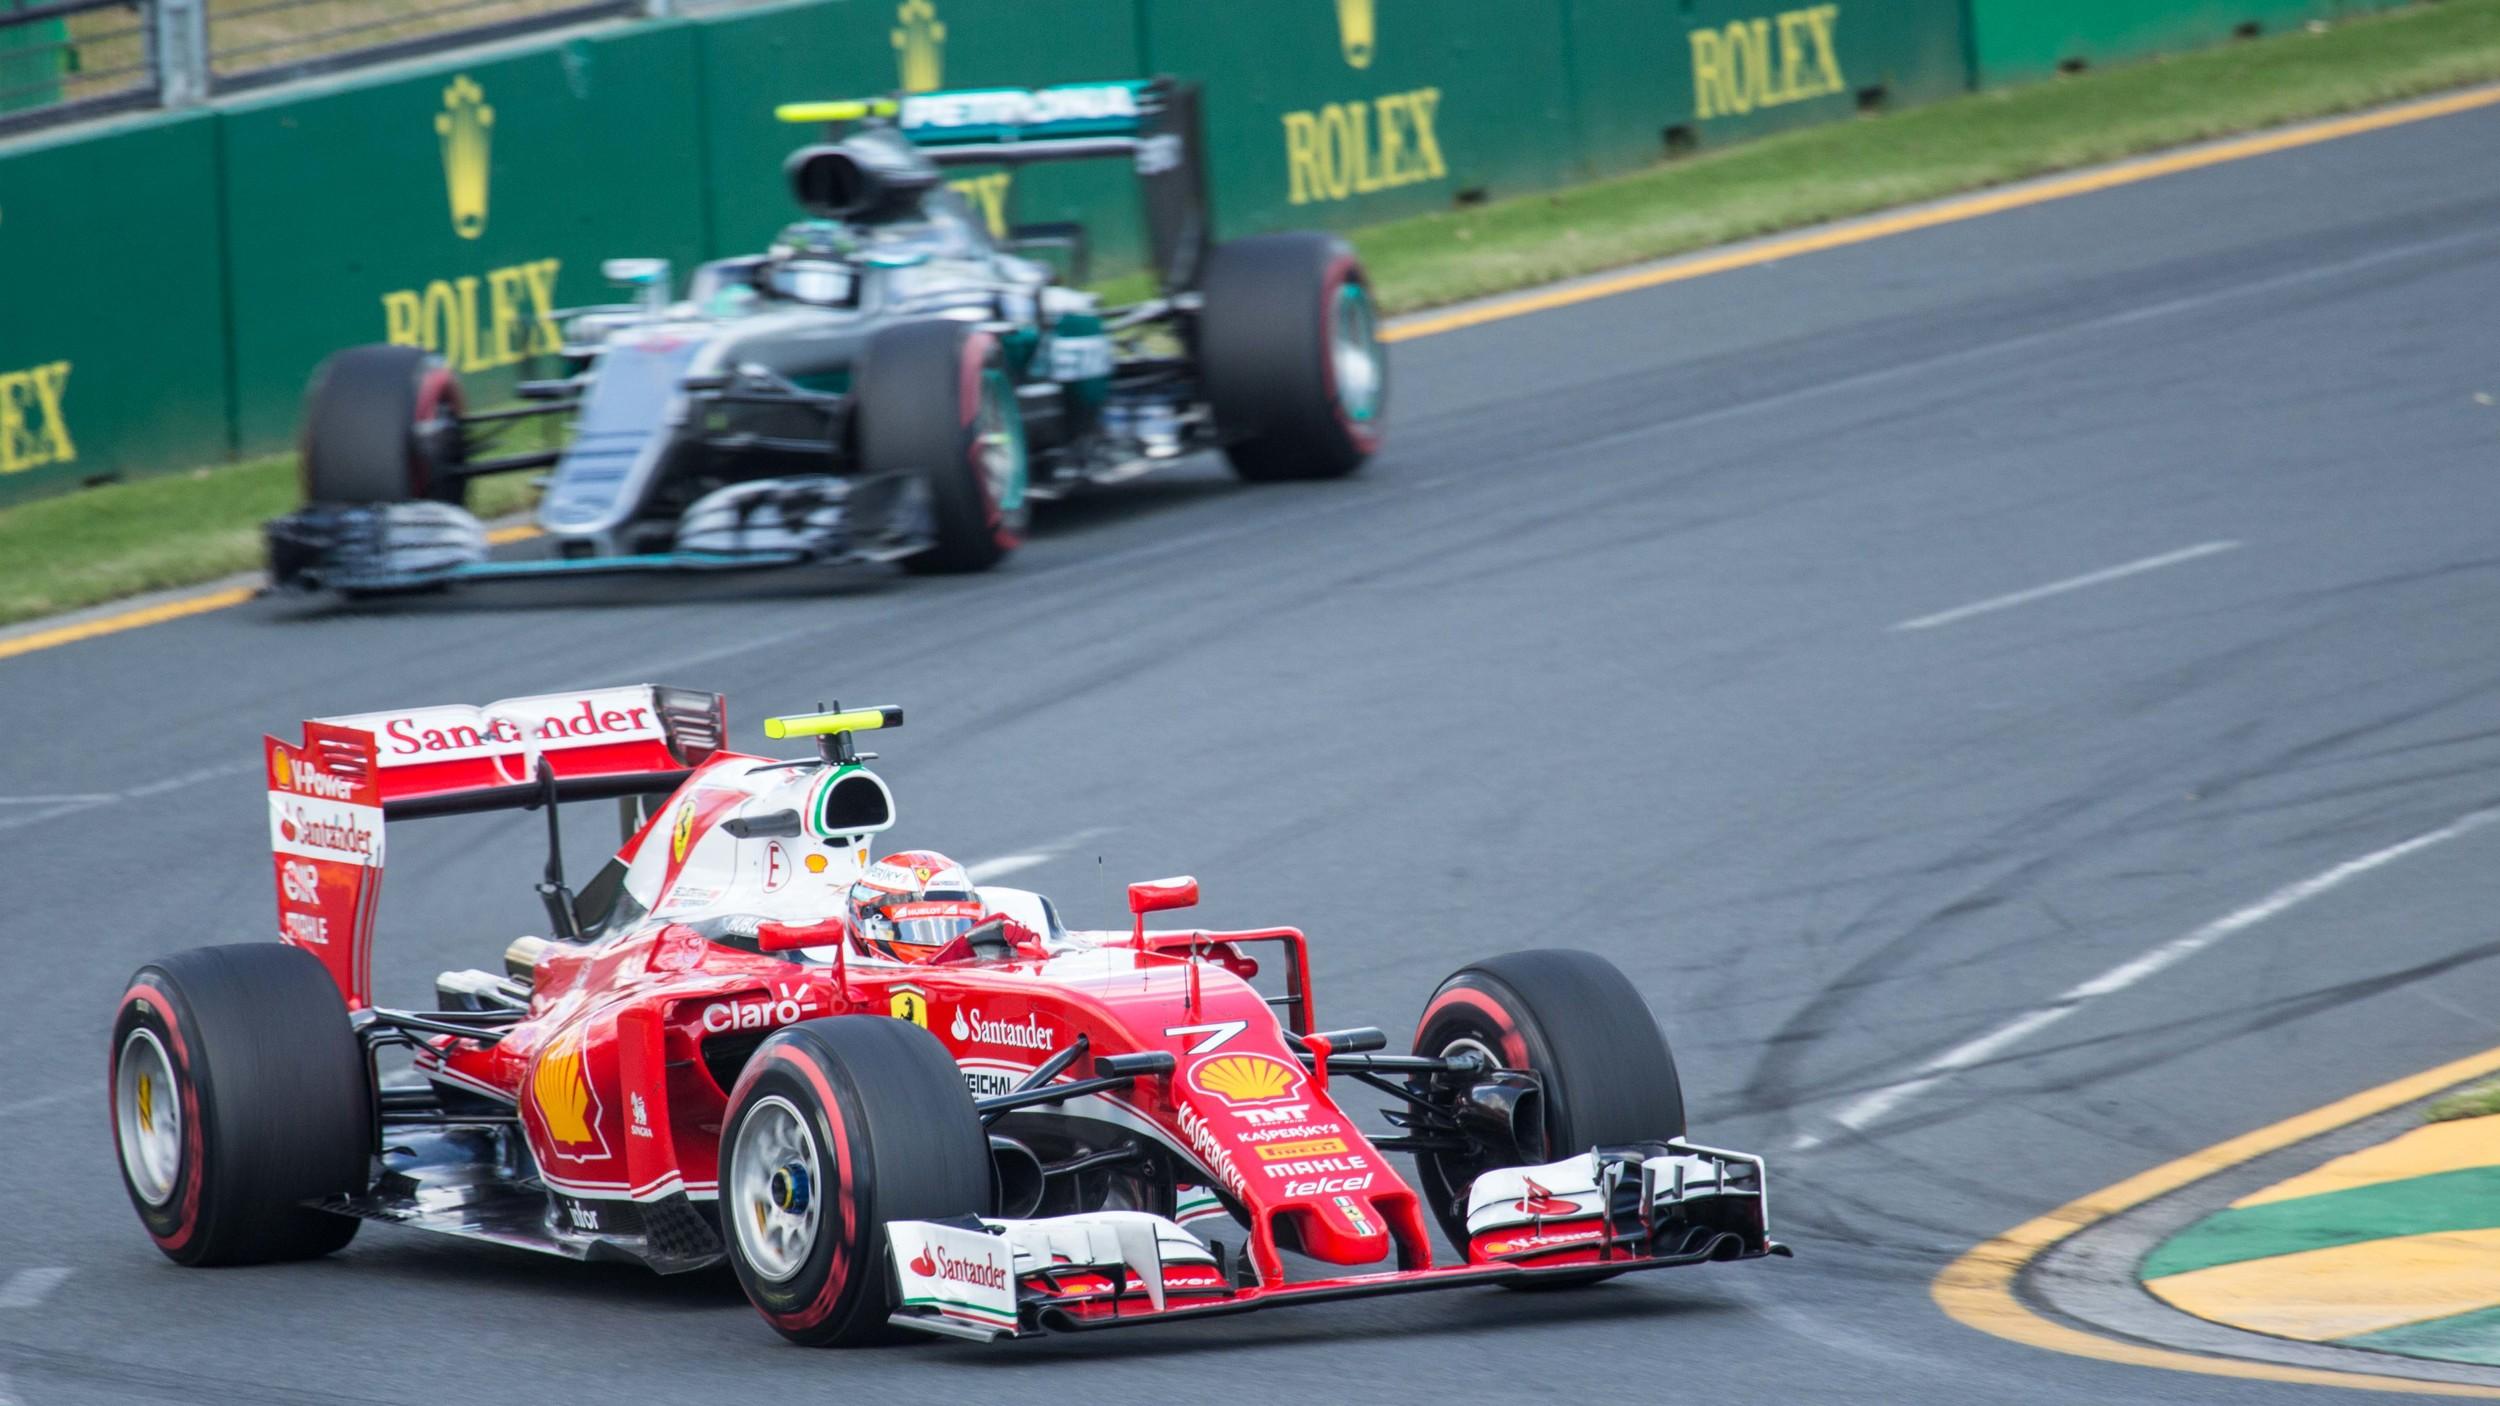 Raikkonen & Rosberg at Turn 15